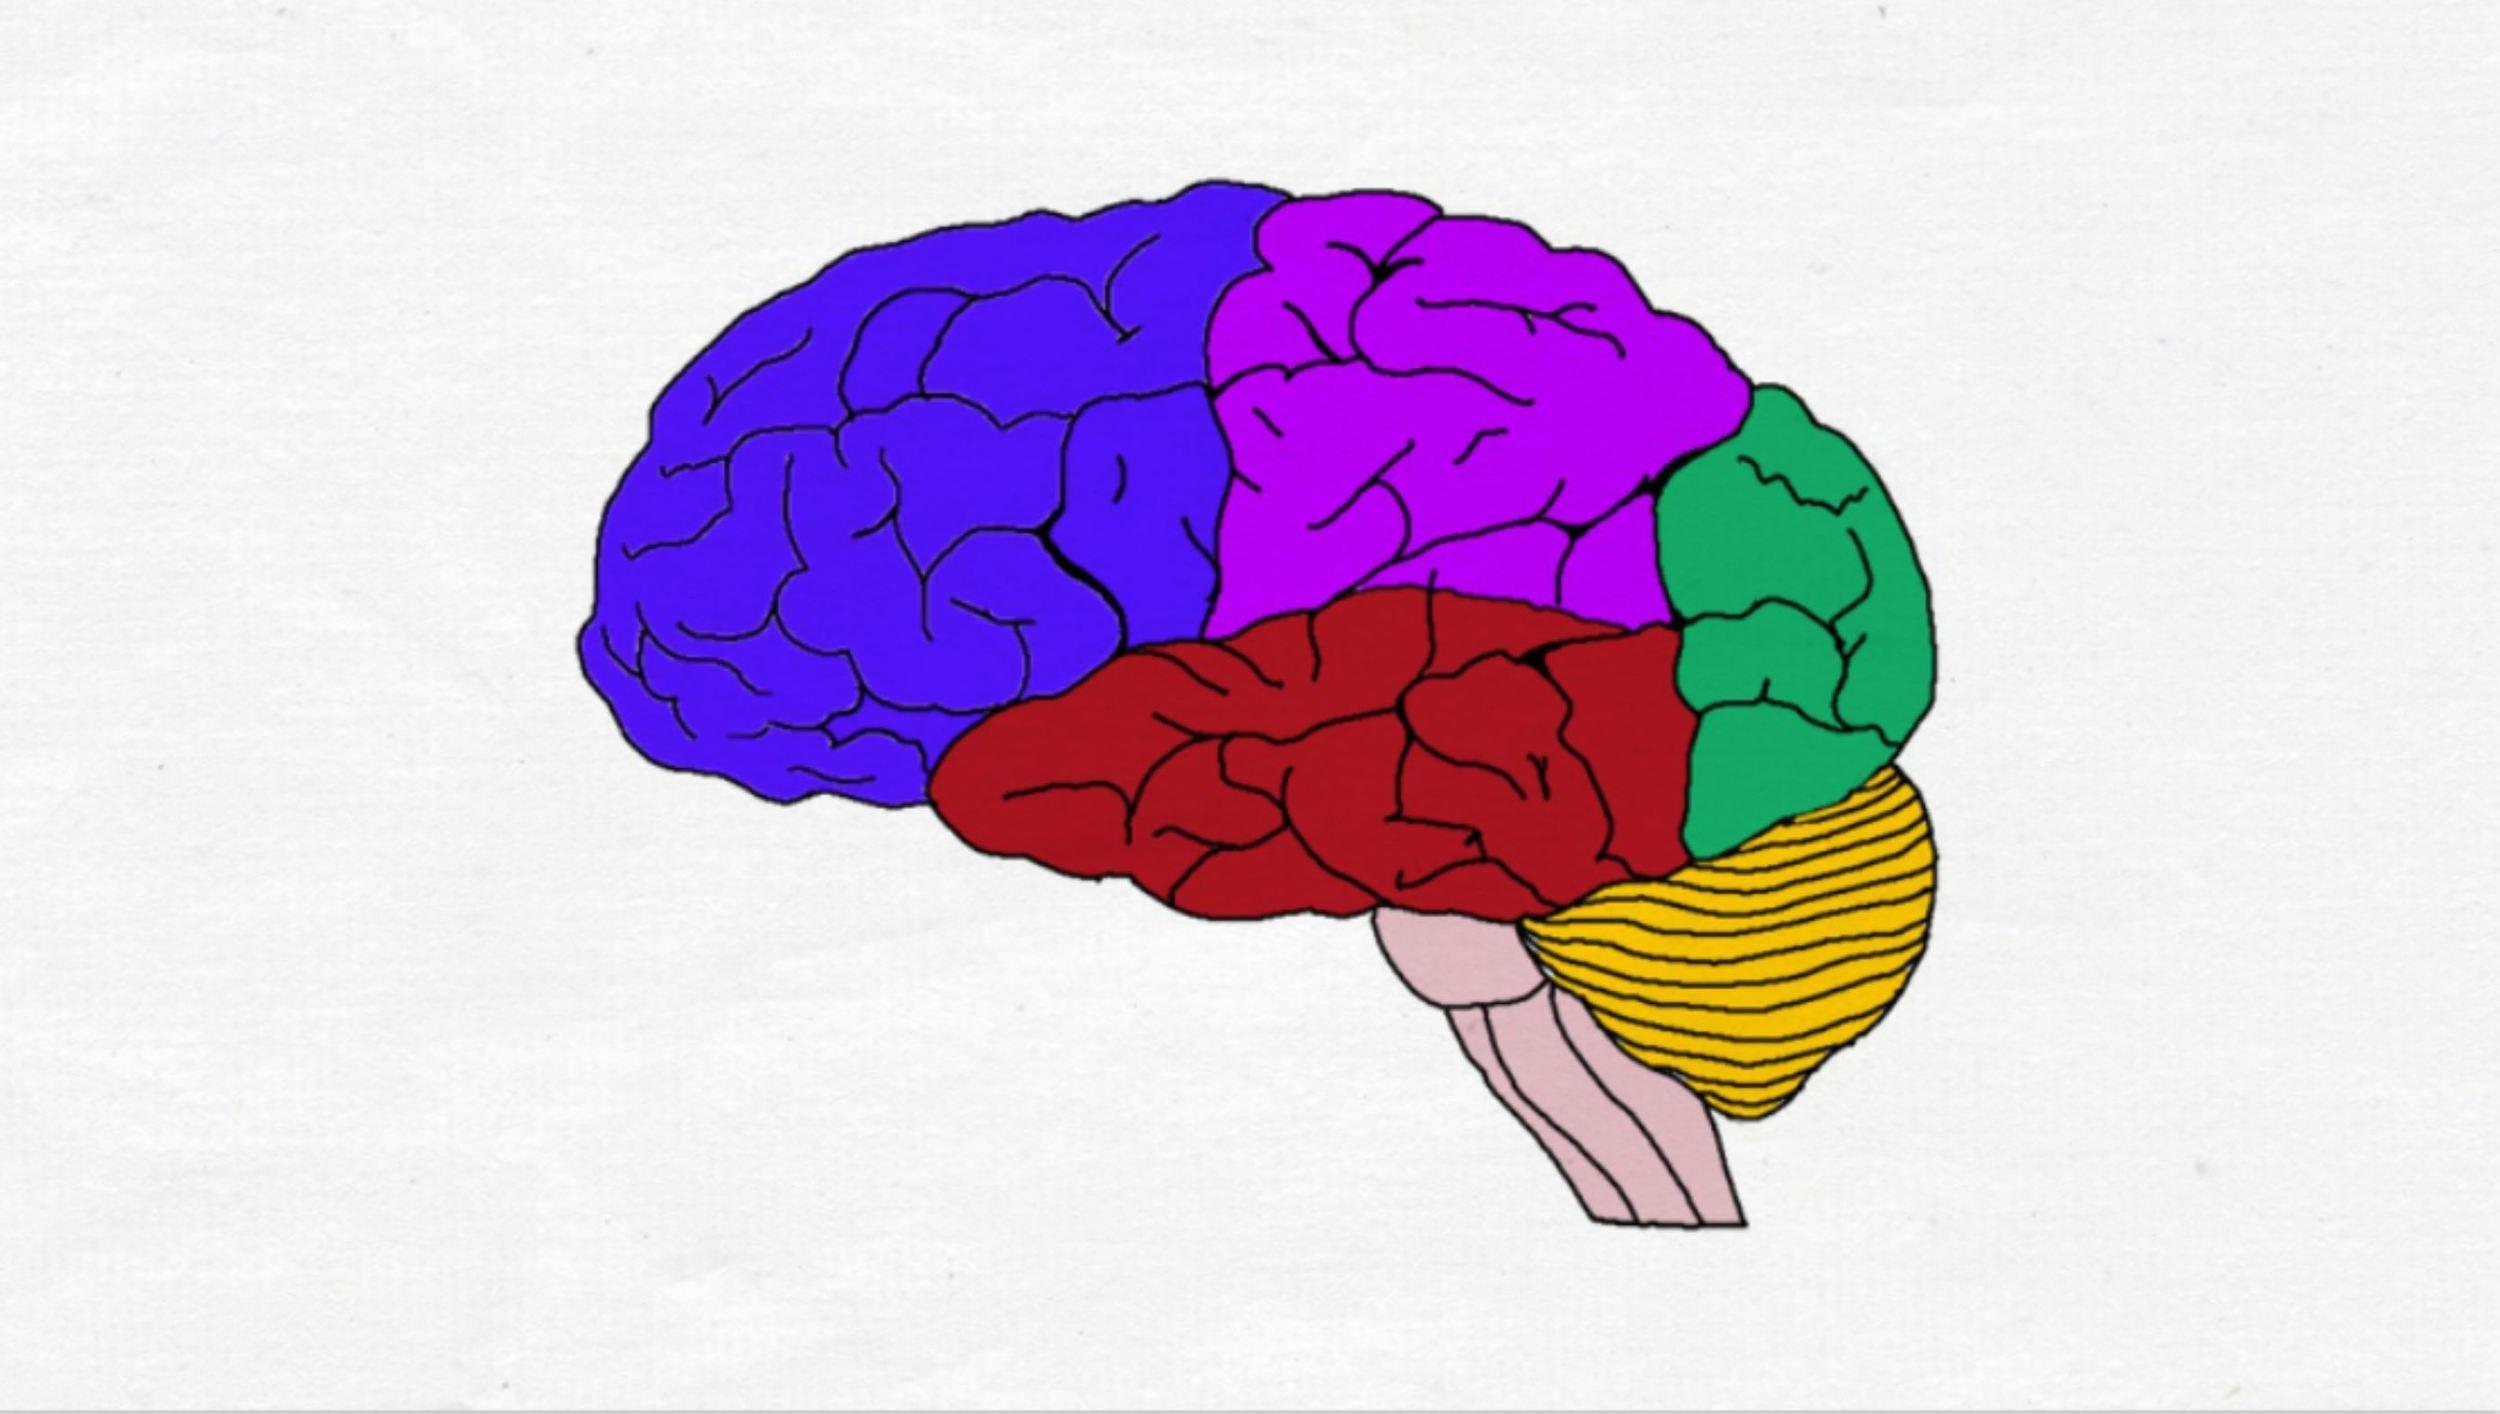 "2-Minute Neuroscience<a href=""/blog/2-minute-neuroscience-lobes-landmarks-of-the-brain-surface-lateral-view"">→</a><strong>Lobes and Landmarks of the Brain Surface</strong>"